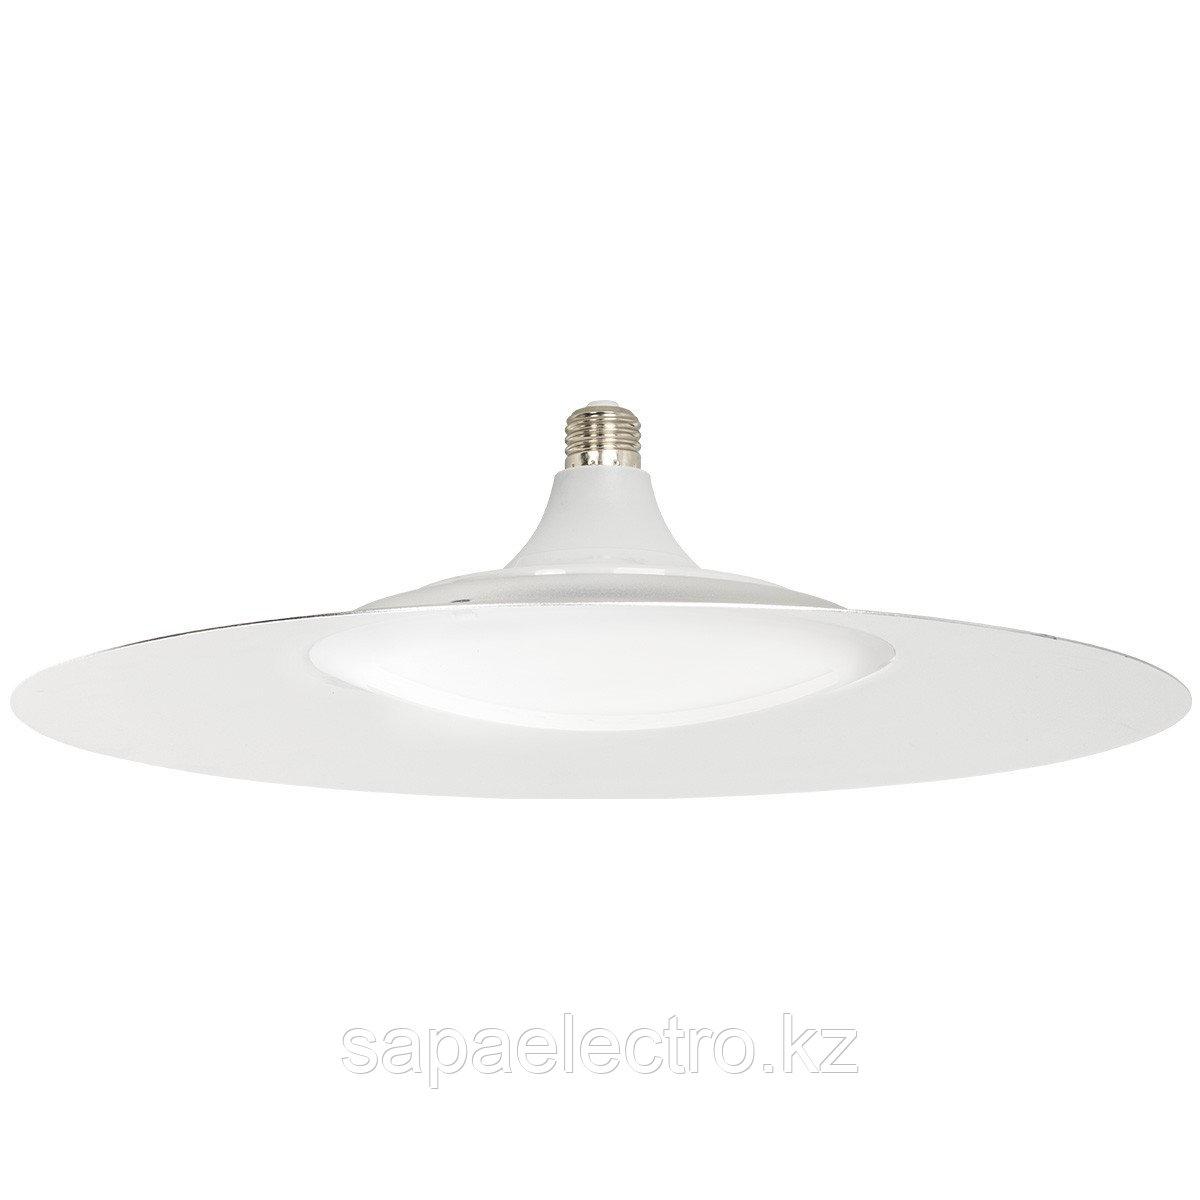 Свет-к UFO70 LED 70W E27 5700-6000K   (TS) 10шт